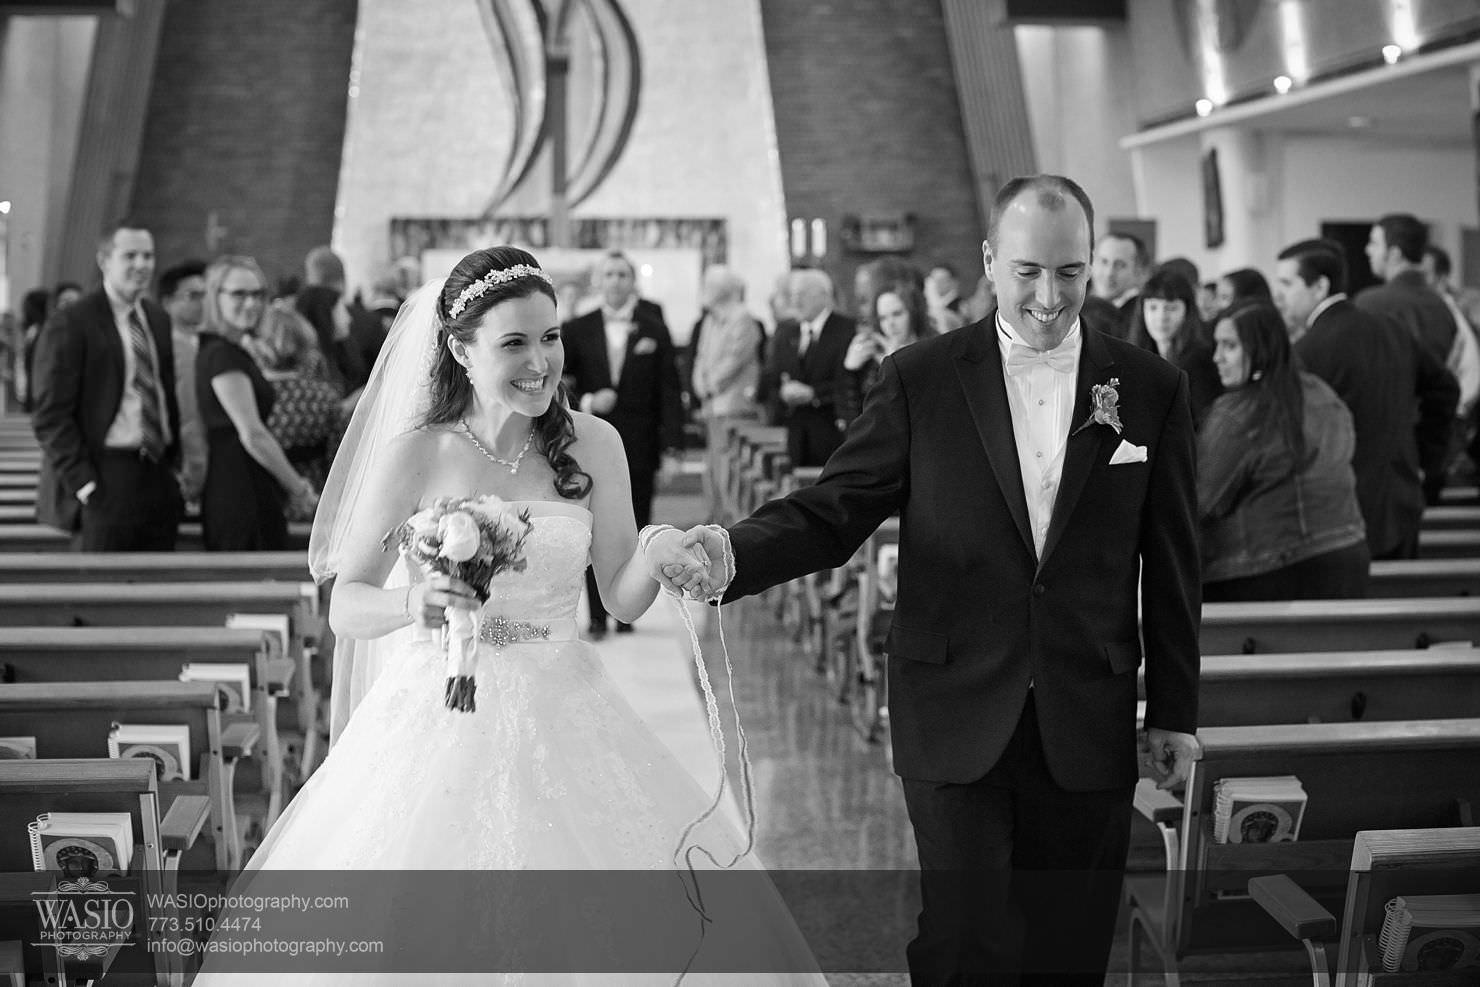 Rosemont-Fall-Wedding-Lauren-and-David-016 Rosemont Fall Wedding - Lauren + David